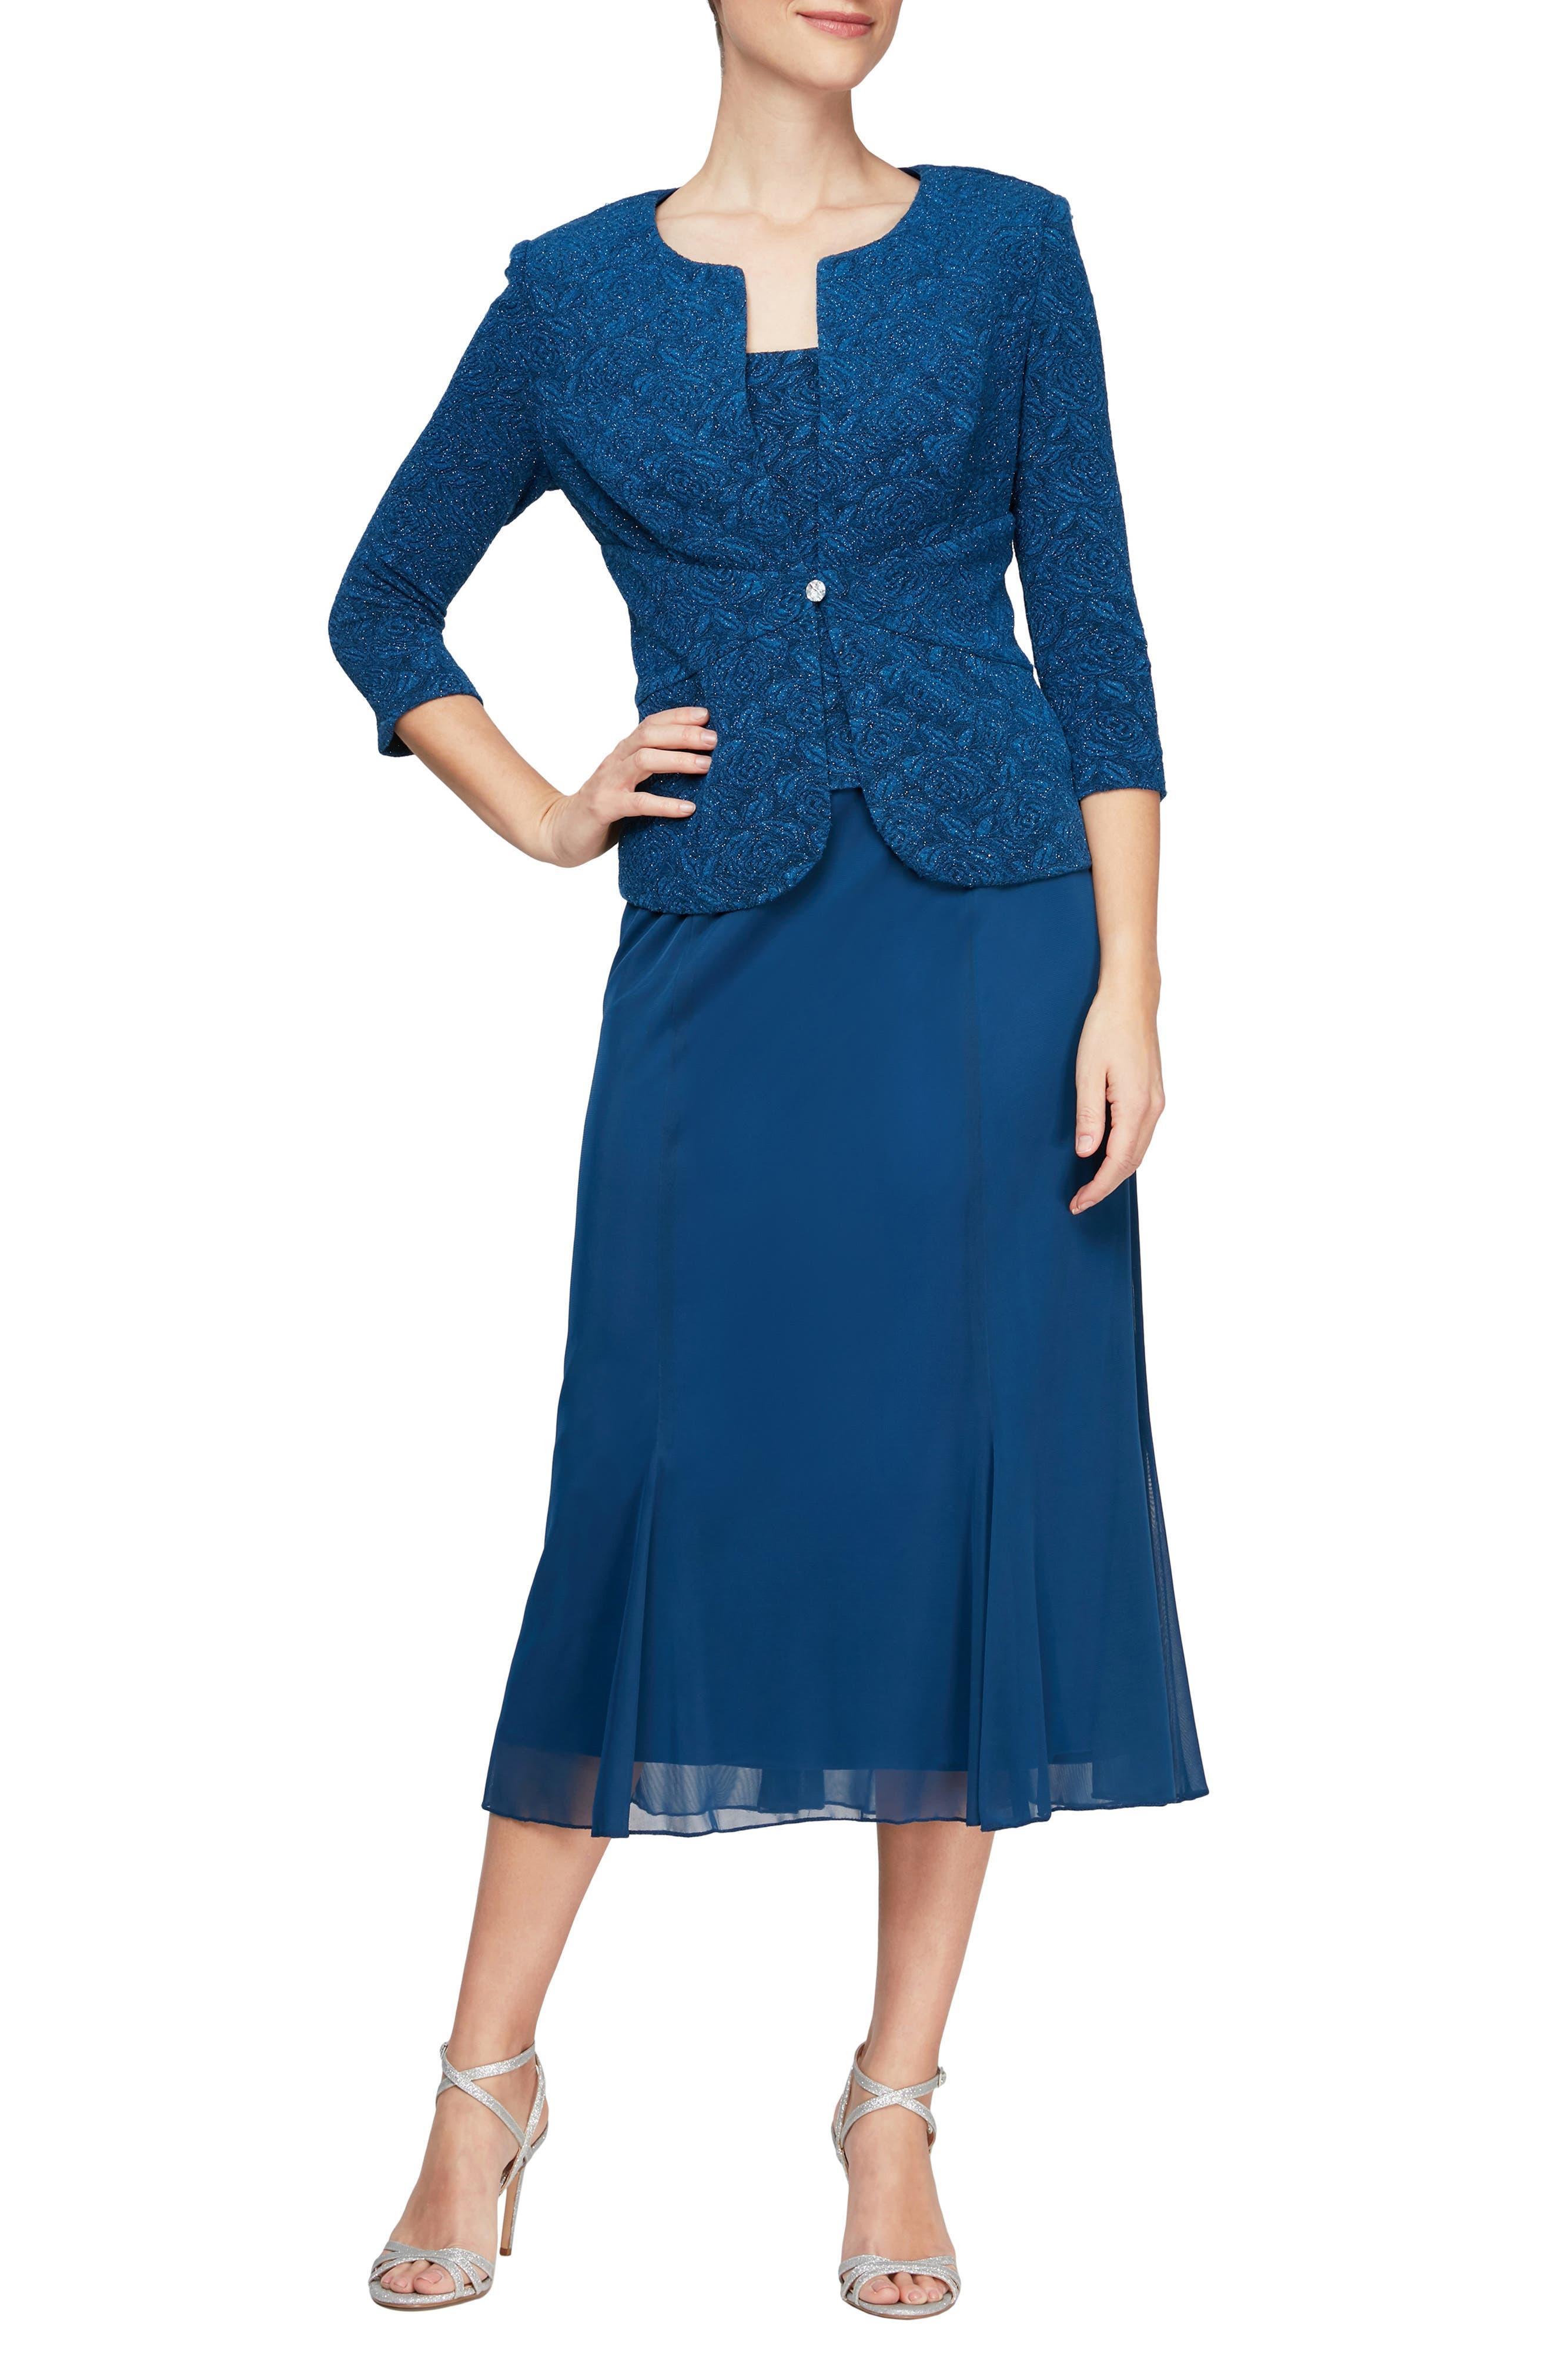 1930s Dresses | 30s Art Deco Dress Womens Alex Evenings Tea Length Mock Jacket Dress Size 18 - Bluegreen $199.00 AT vintagedancer.com